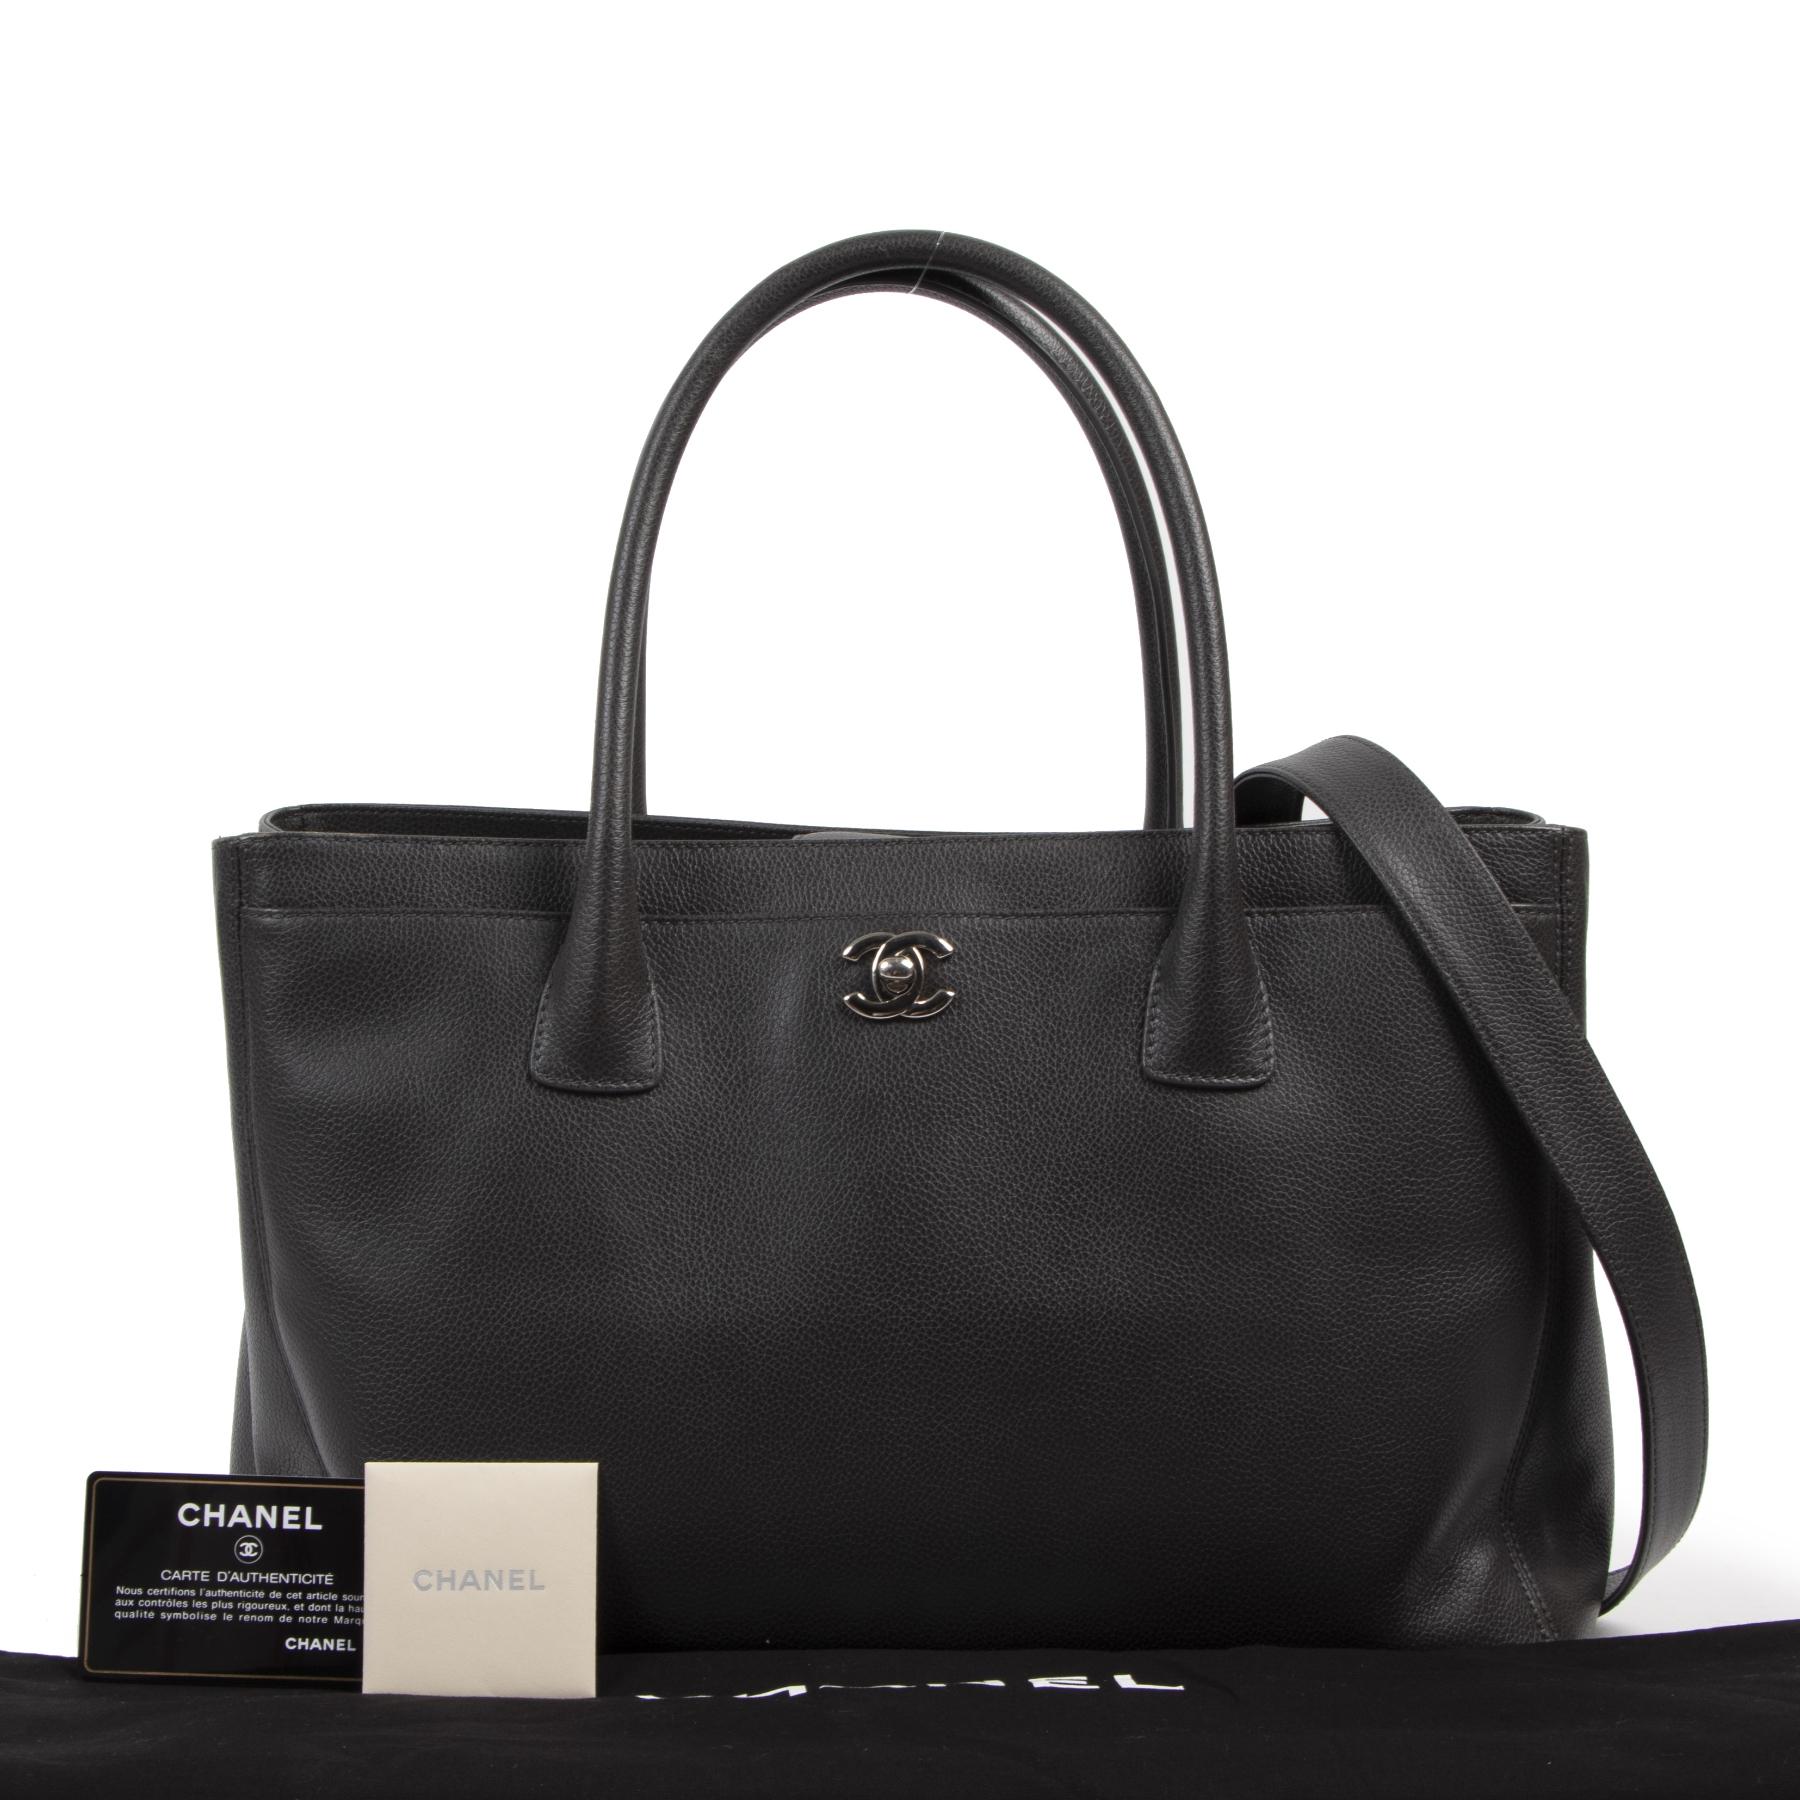 Authentieke tweedehands vintage Chanel Dark Grey Executive Cerf Tote Bag koop online webshop LabelLOV